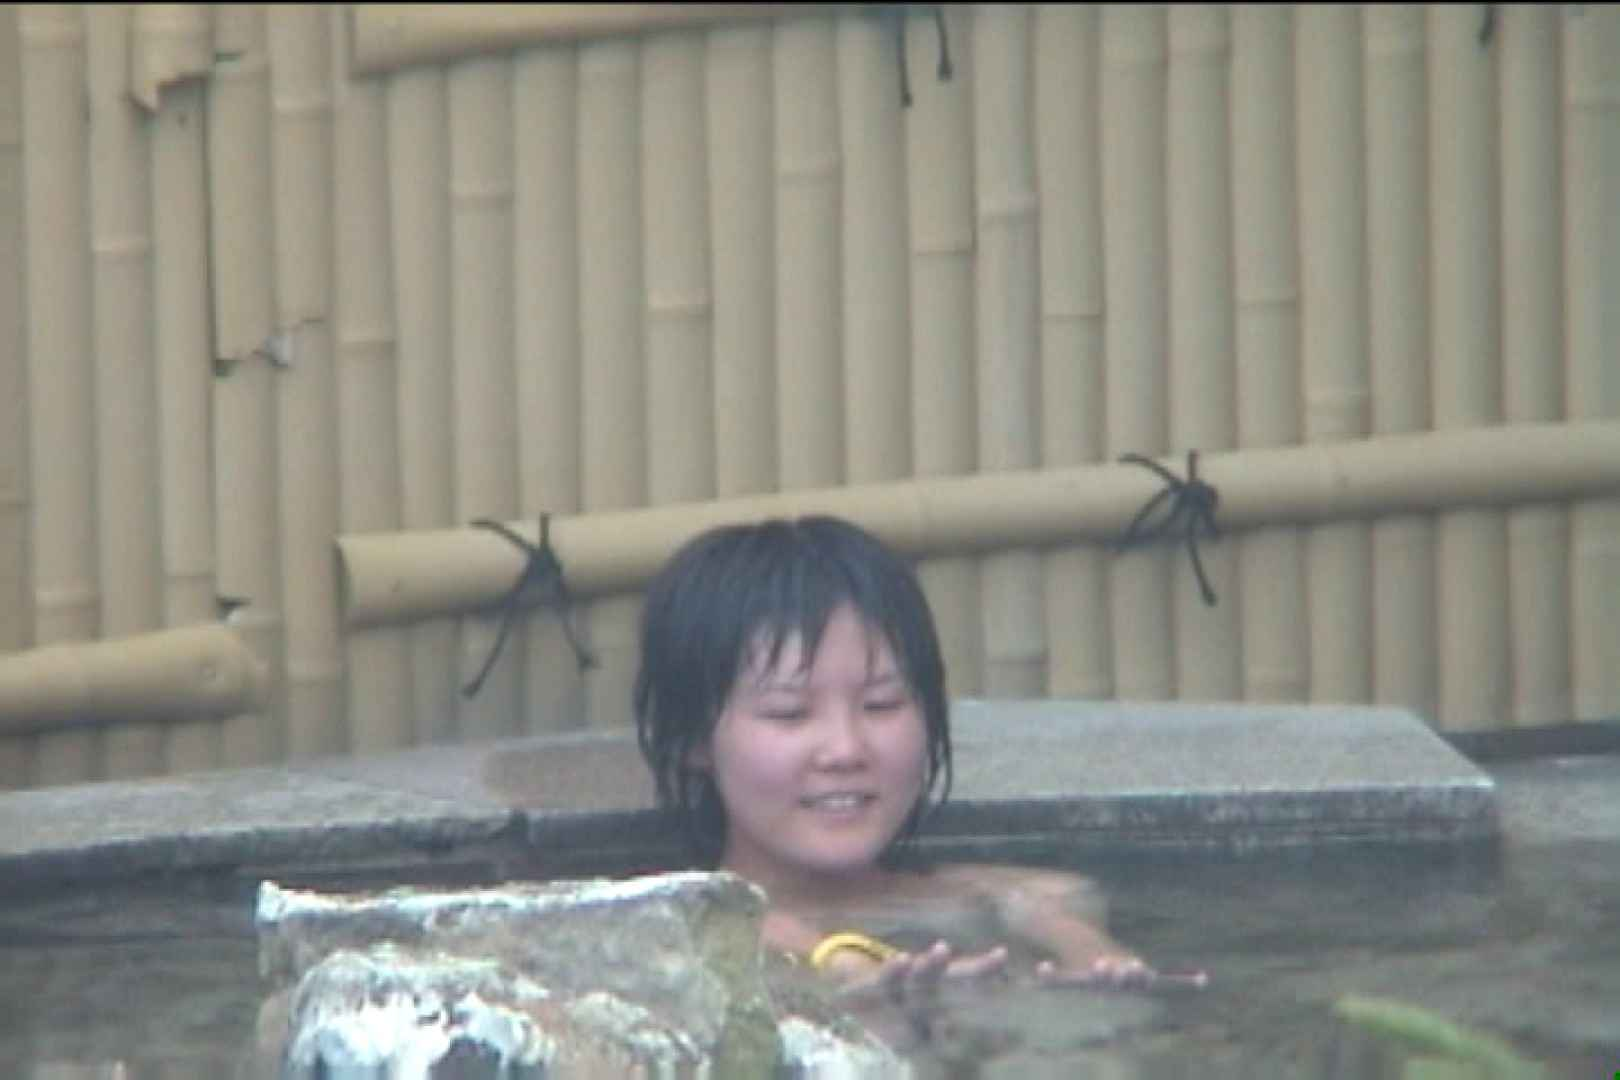 Aquaな露天風呂Vol.99【VIP限定】 露天風呂編  108PIX 100